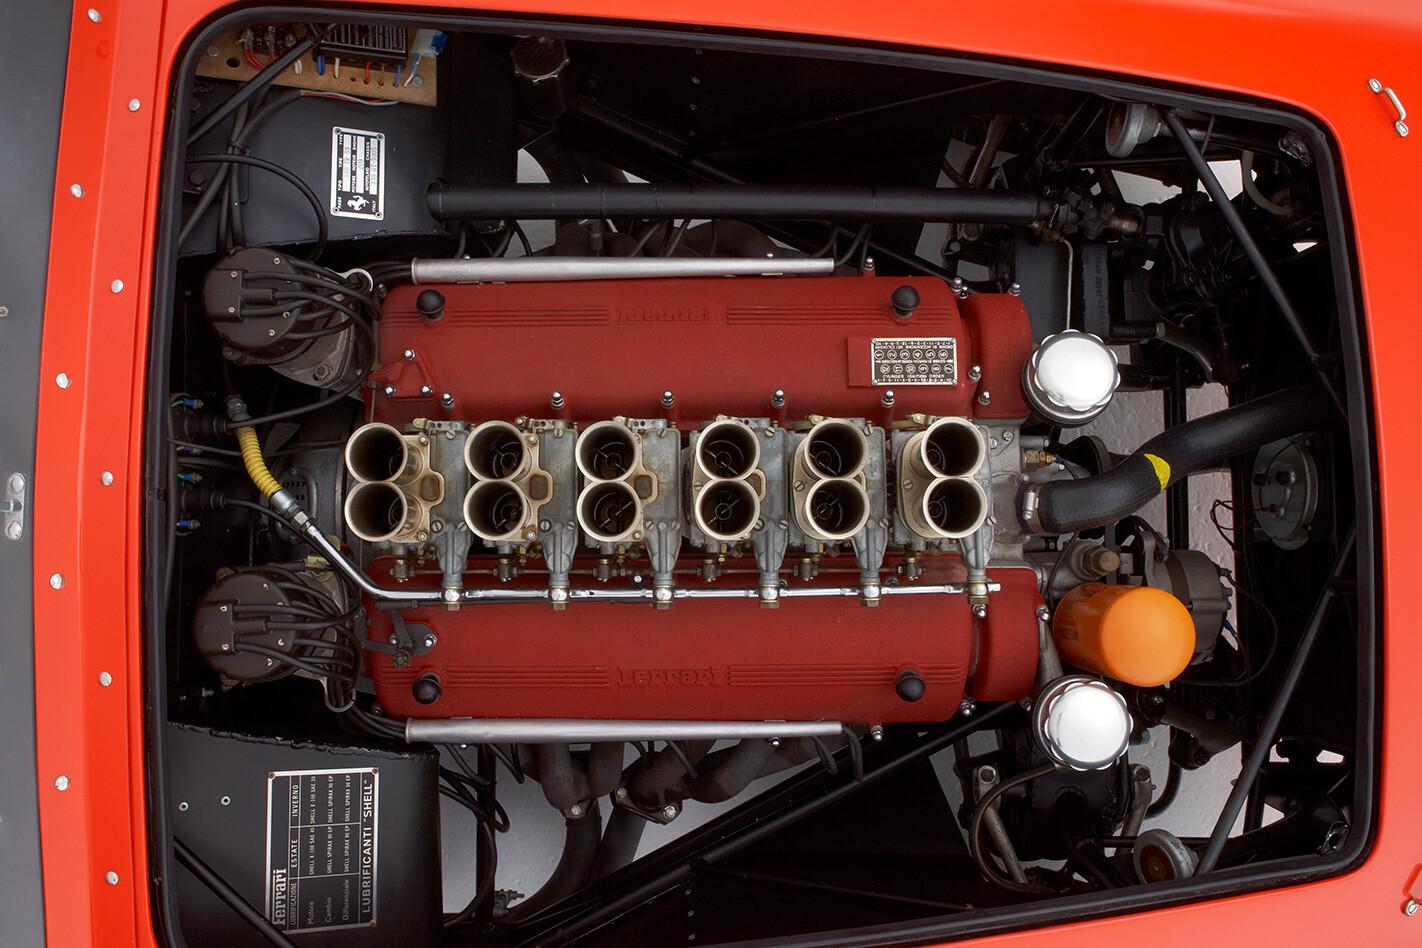 1959 Ferrari 250 Testa Rossa engine